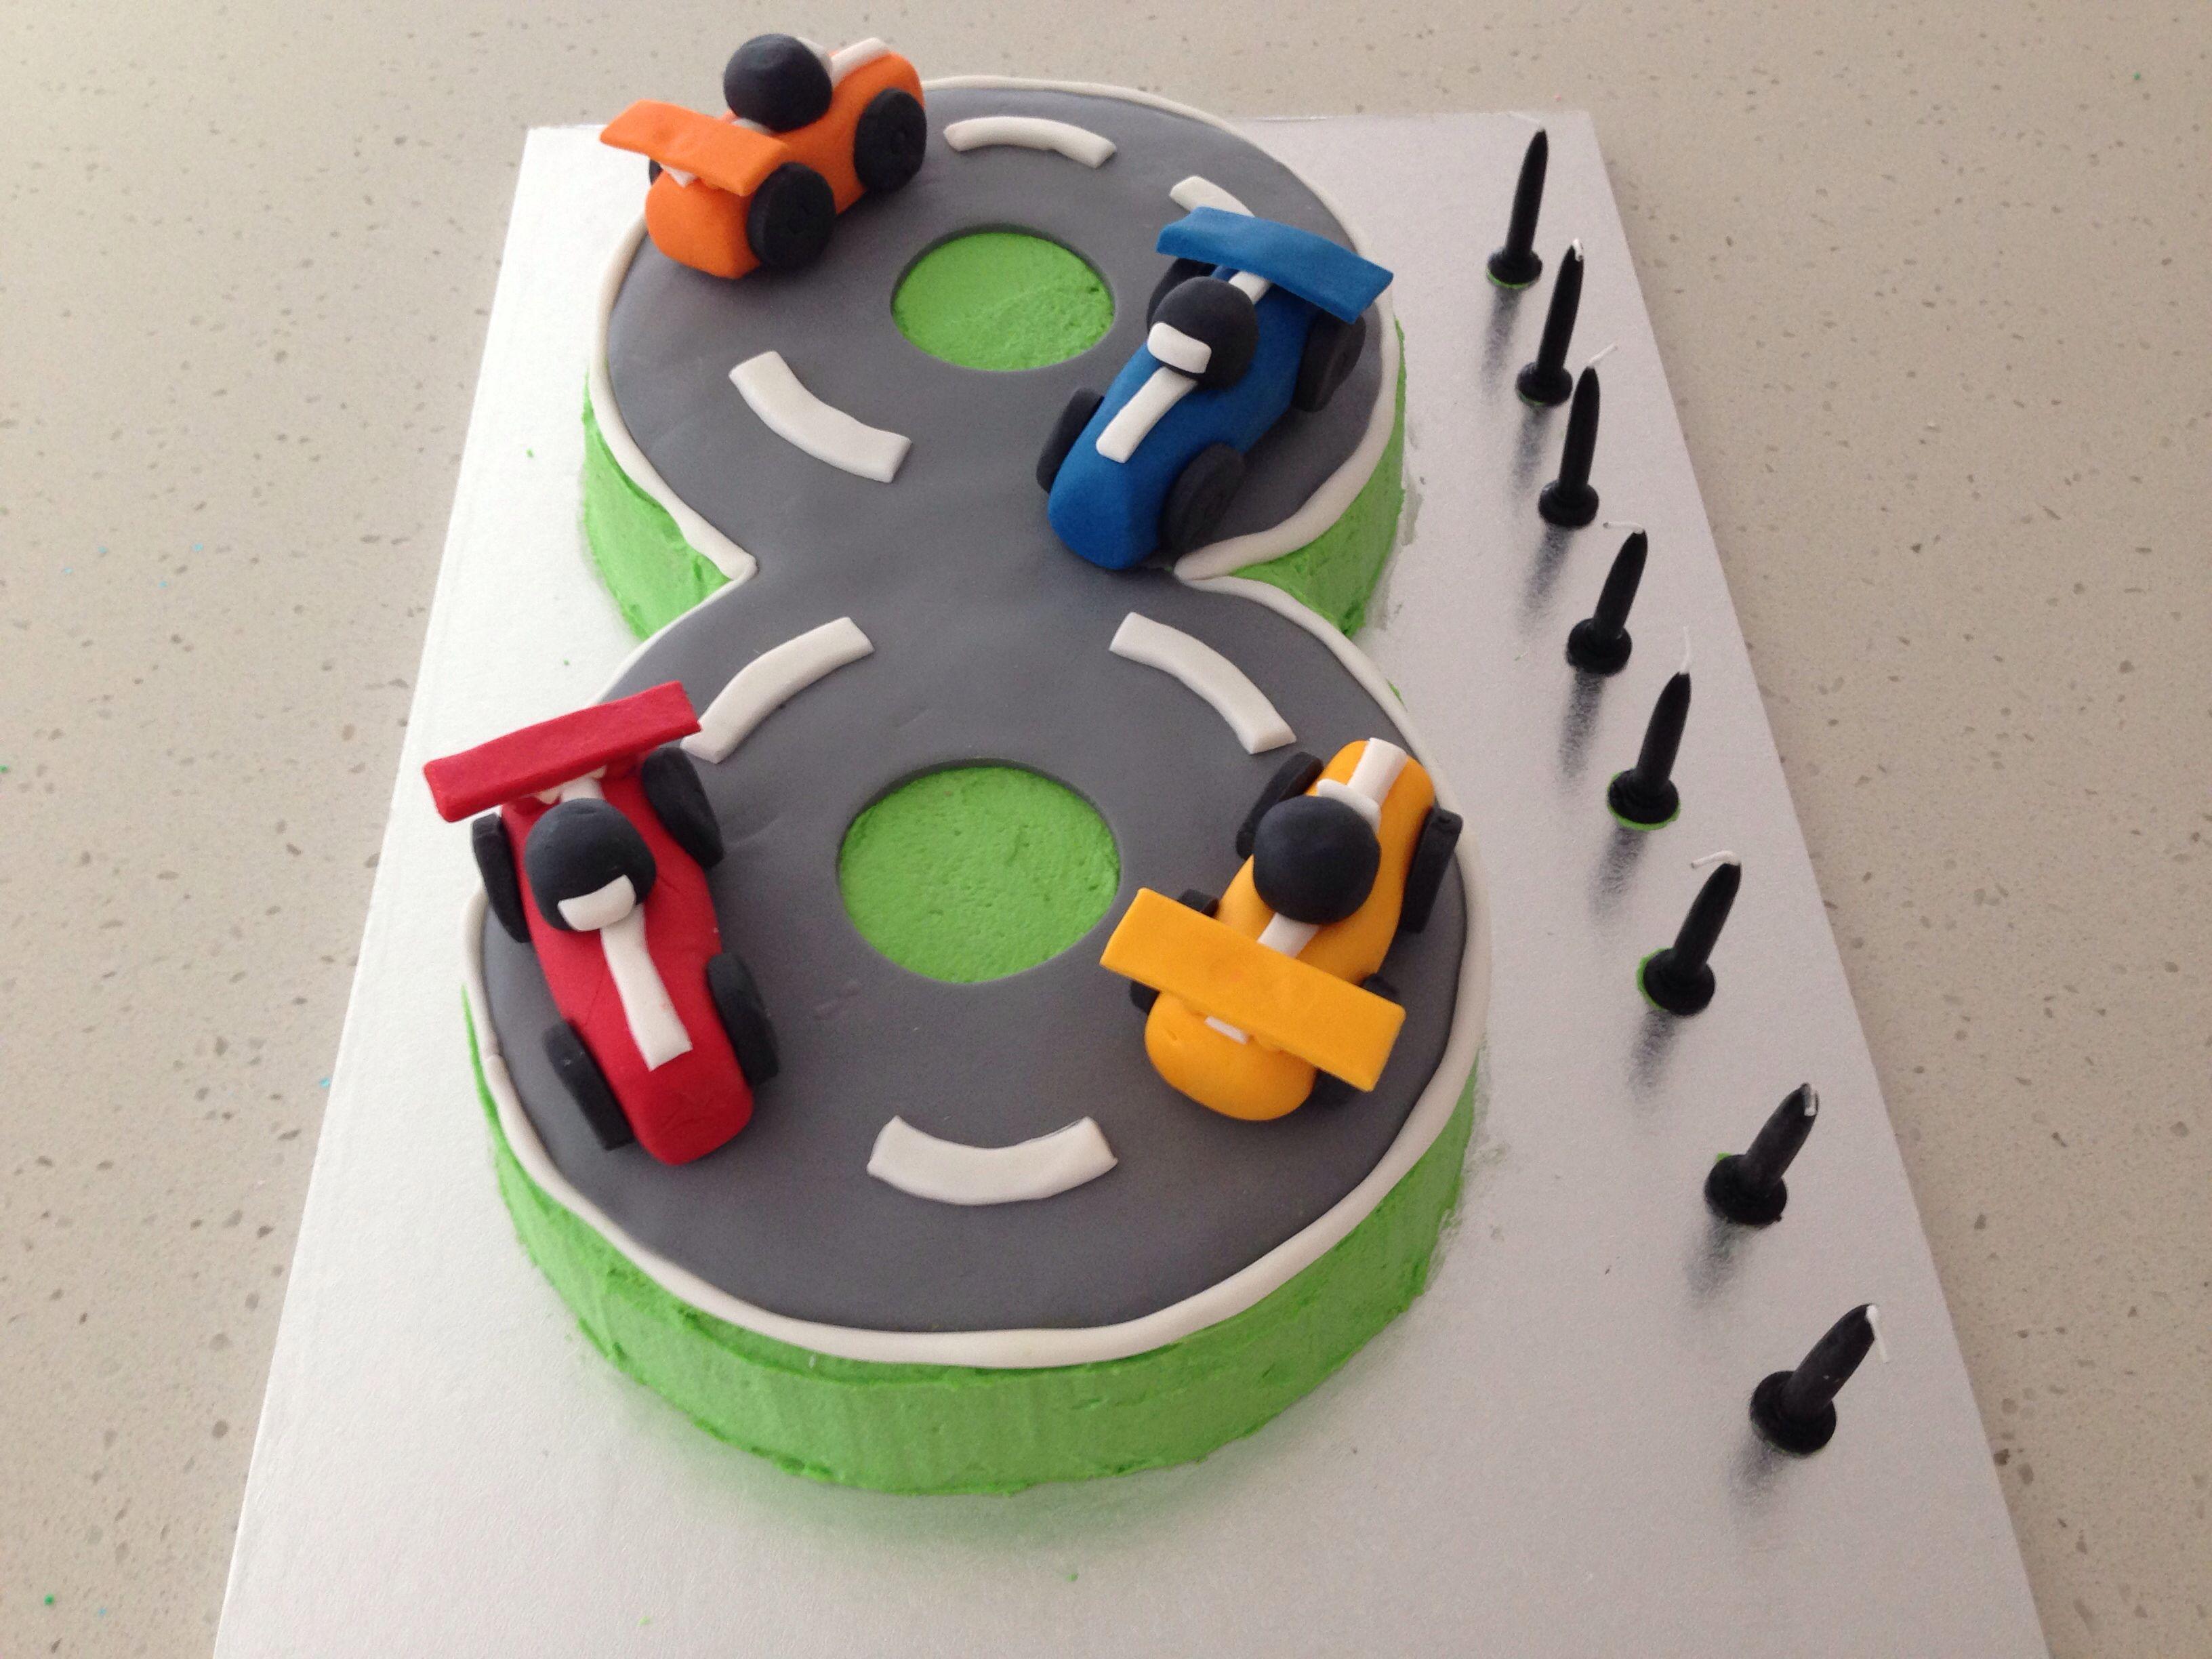 Slot car track cake inspired by httpcakejournaltutorials slot car track cake inspired by httpcakejournaltutorials baditri Choice Image